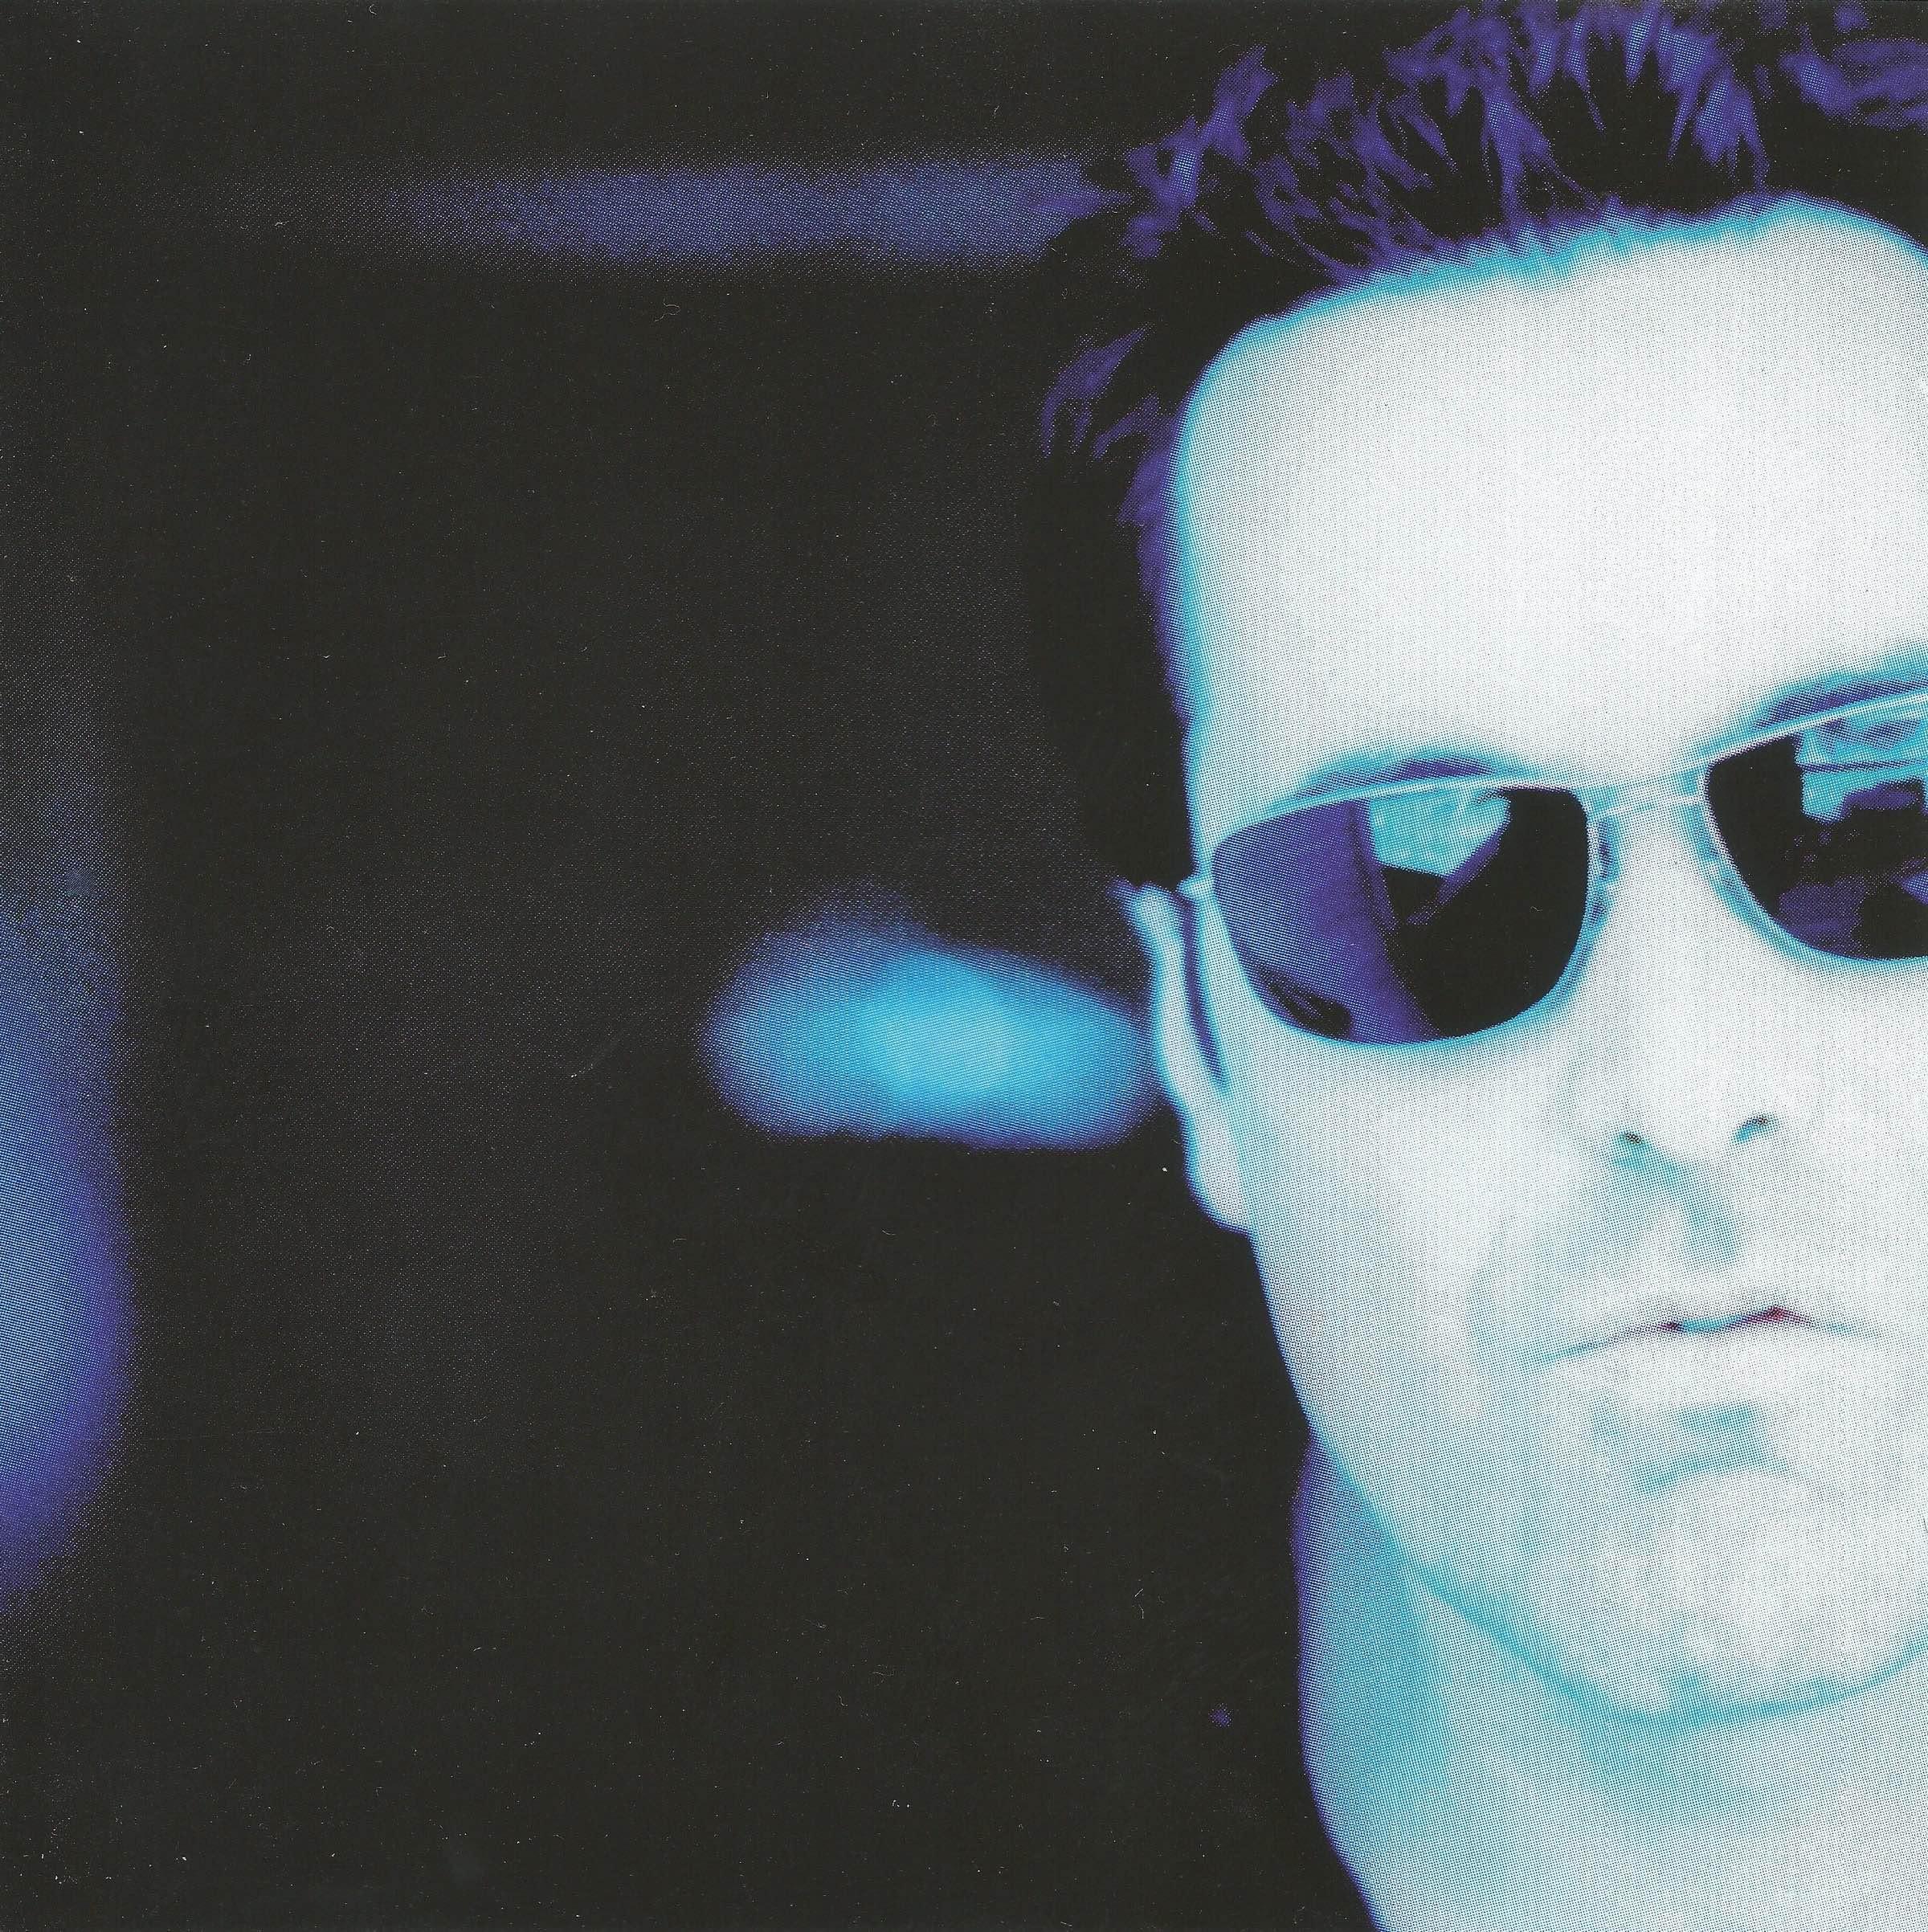 Neal Morse - Neal Morse (1999)